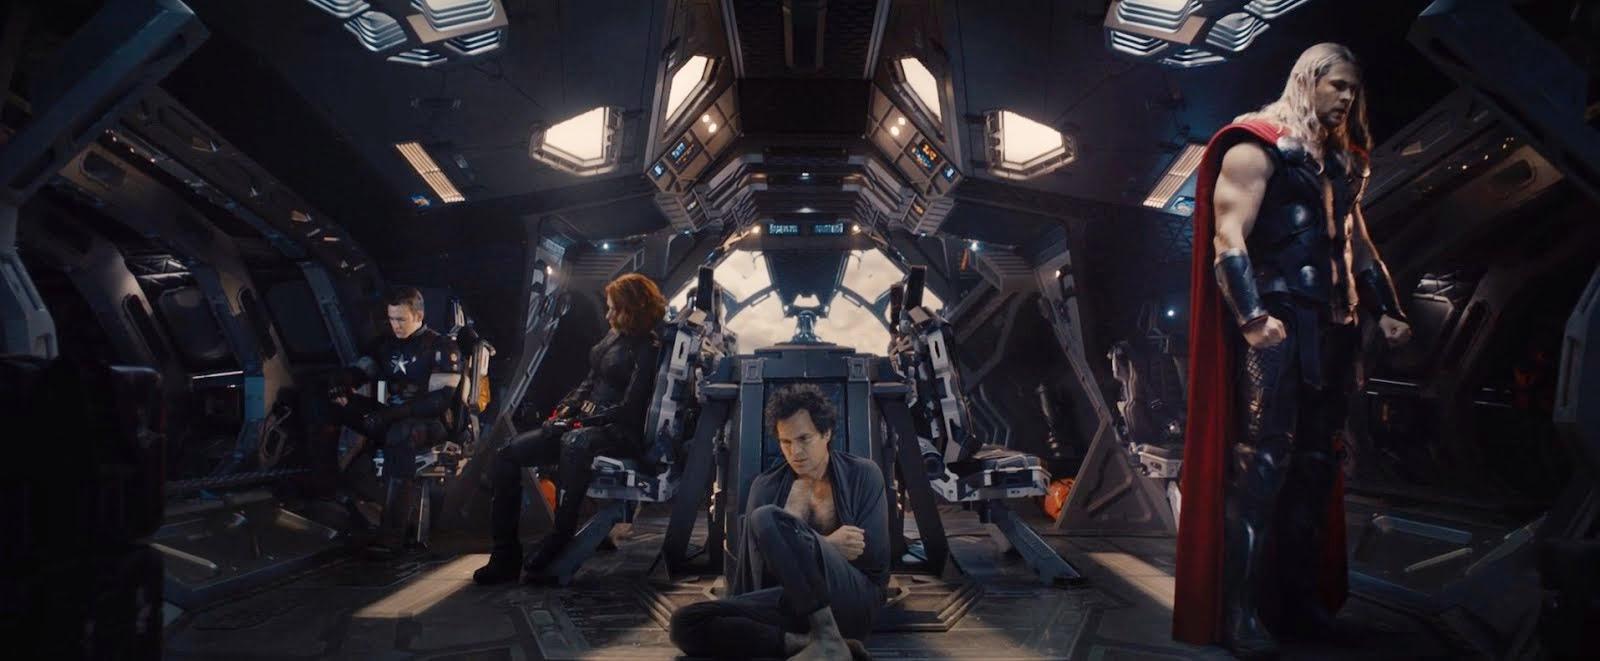 Avengers: Age of Ultron (režie Joss Whedon)